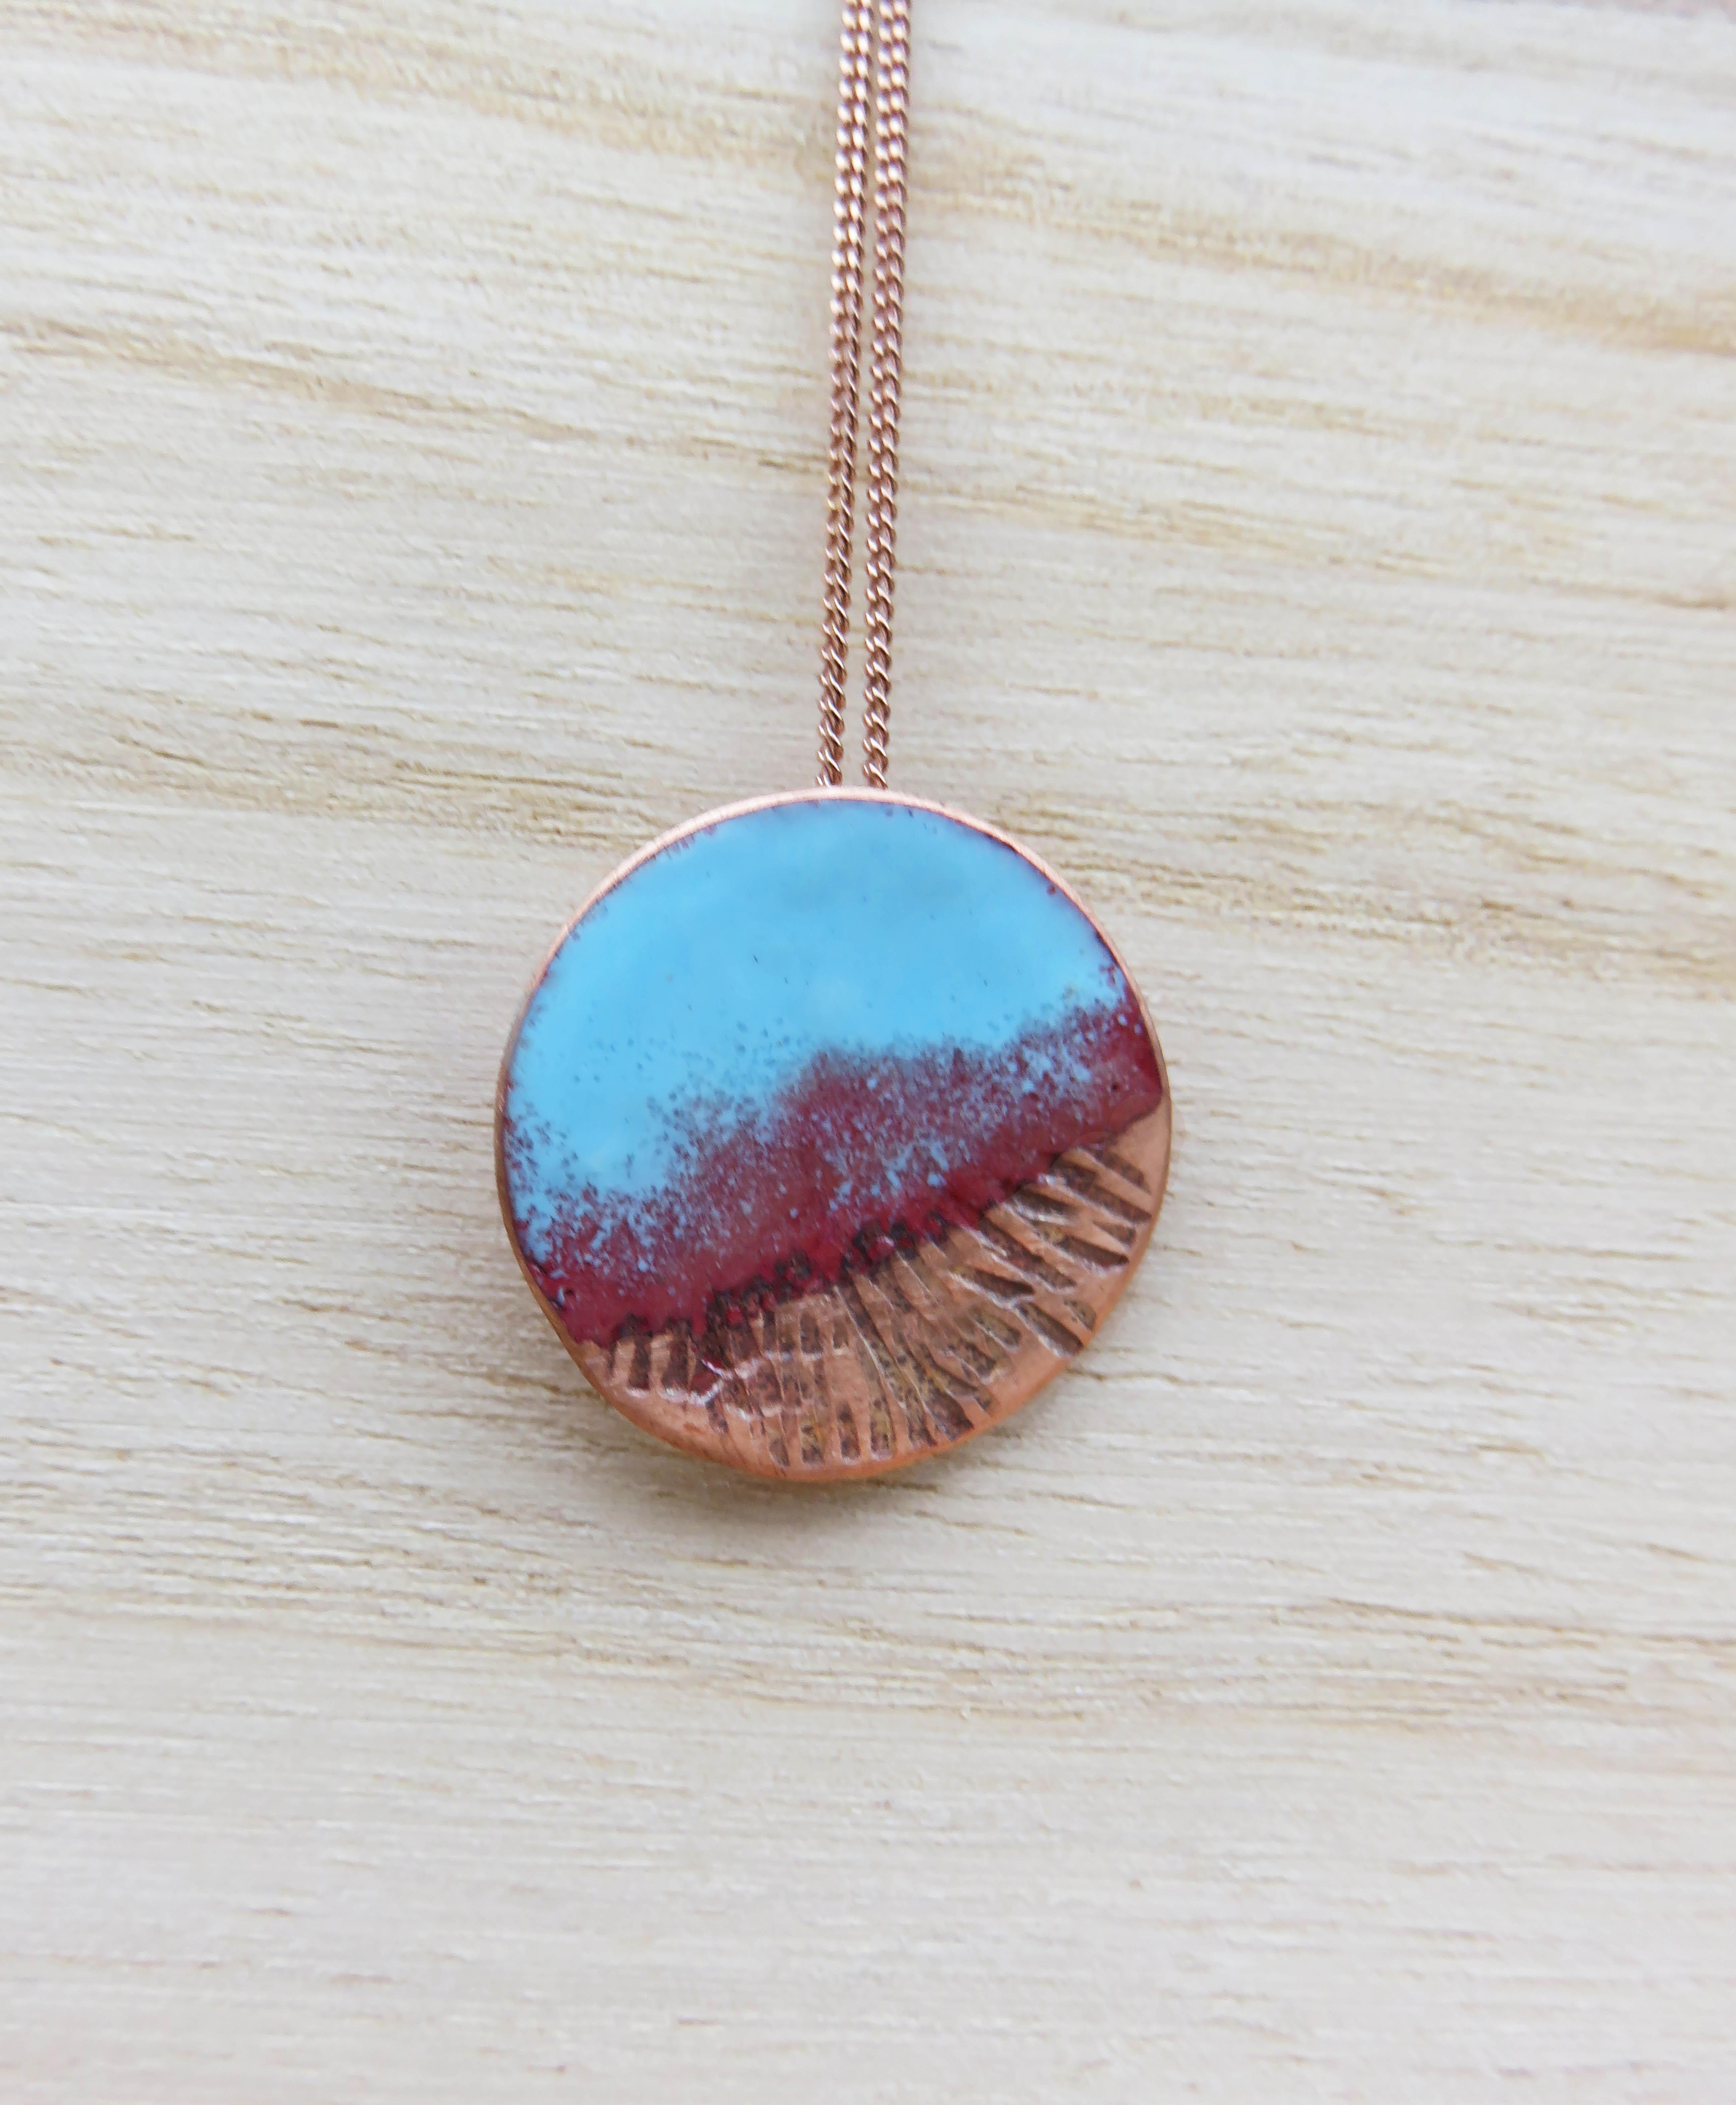 round pendant with texture